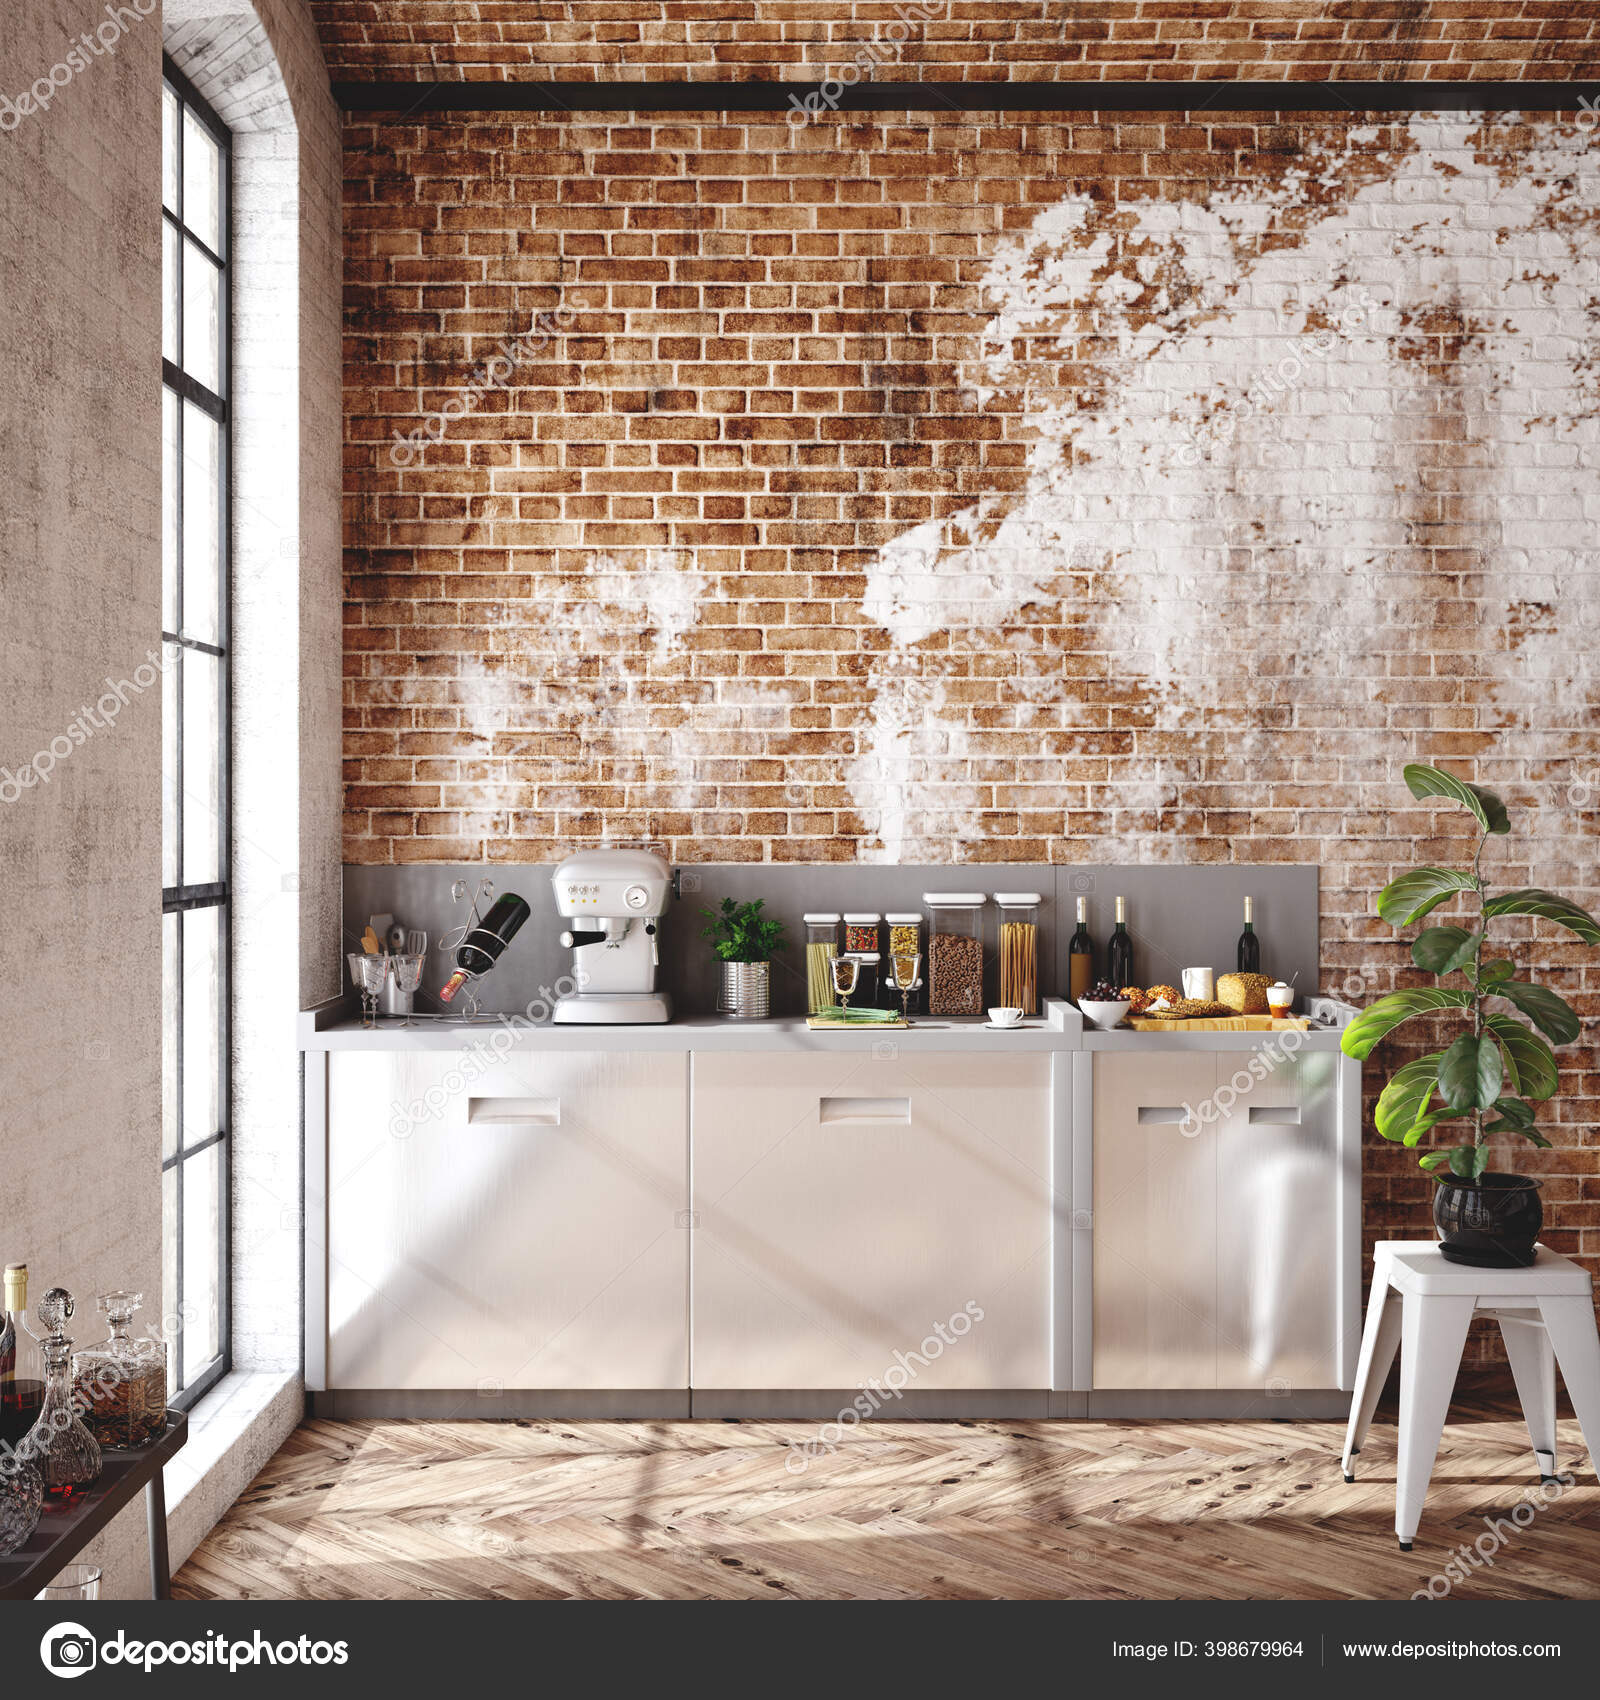 https fr depositphotos com 398679964 stock photo loft apartment kitchen interior industrial html